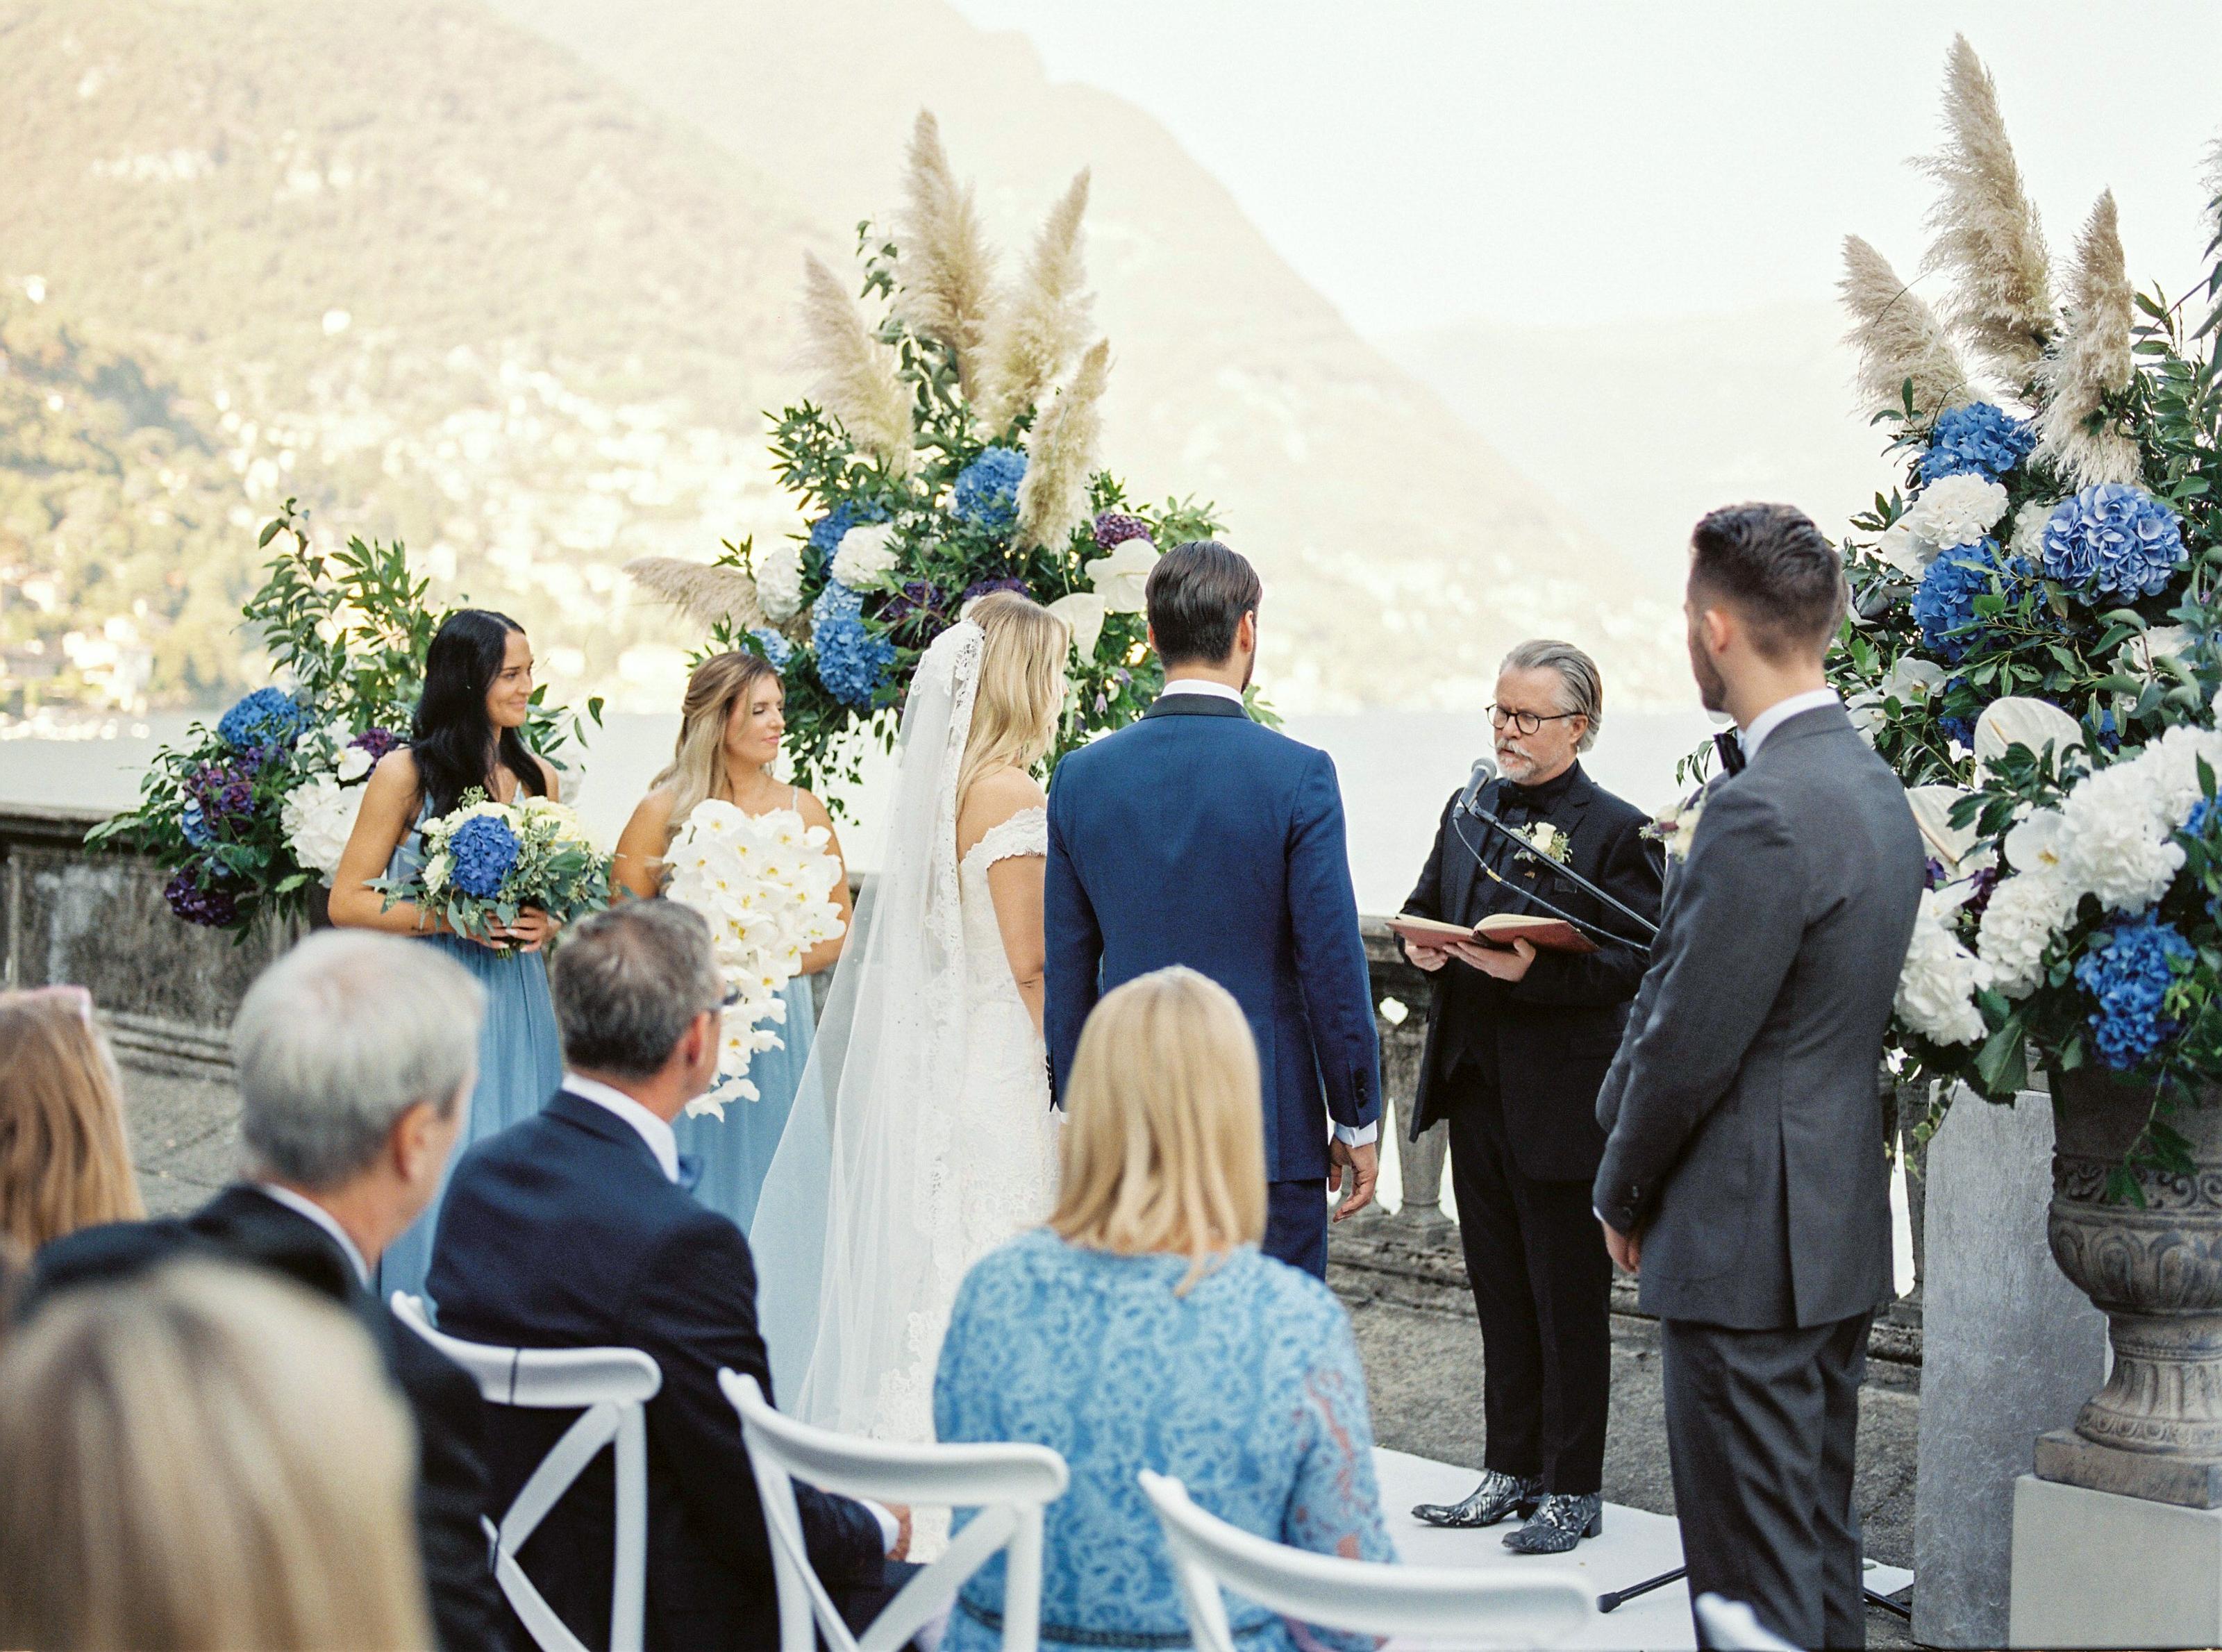 2 BridesPhotography_Molimenti_Wedding_31